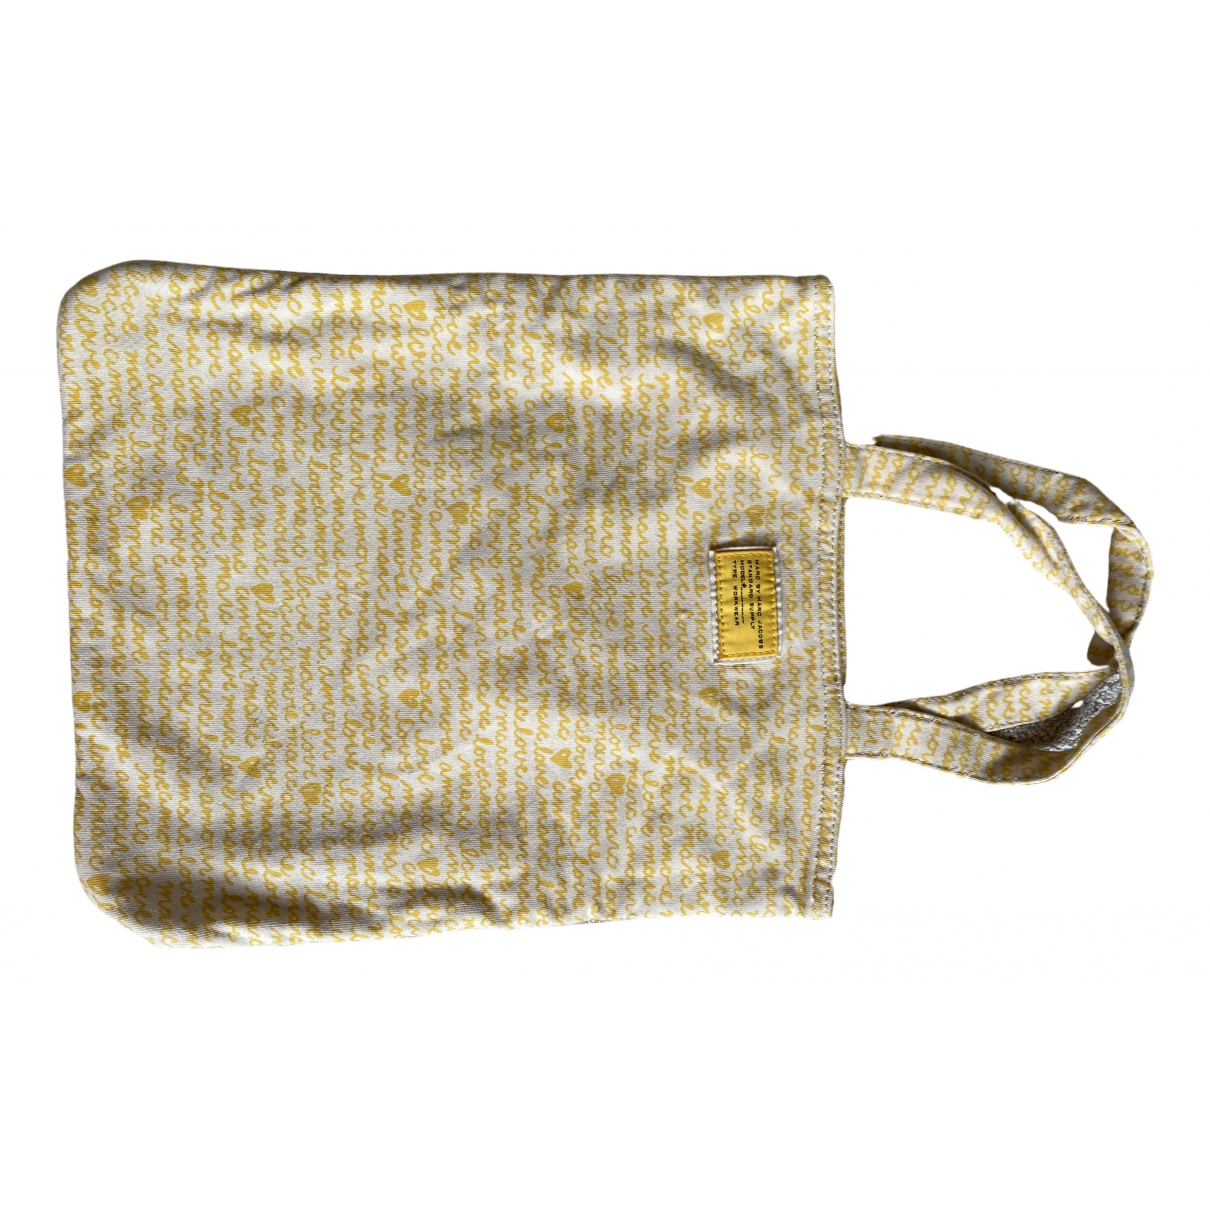 Marc By Marc Jacobs N Yellow Cloth handbag for Women N